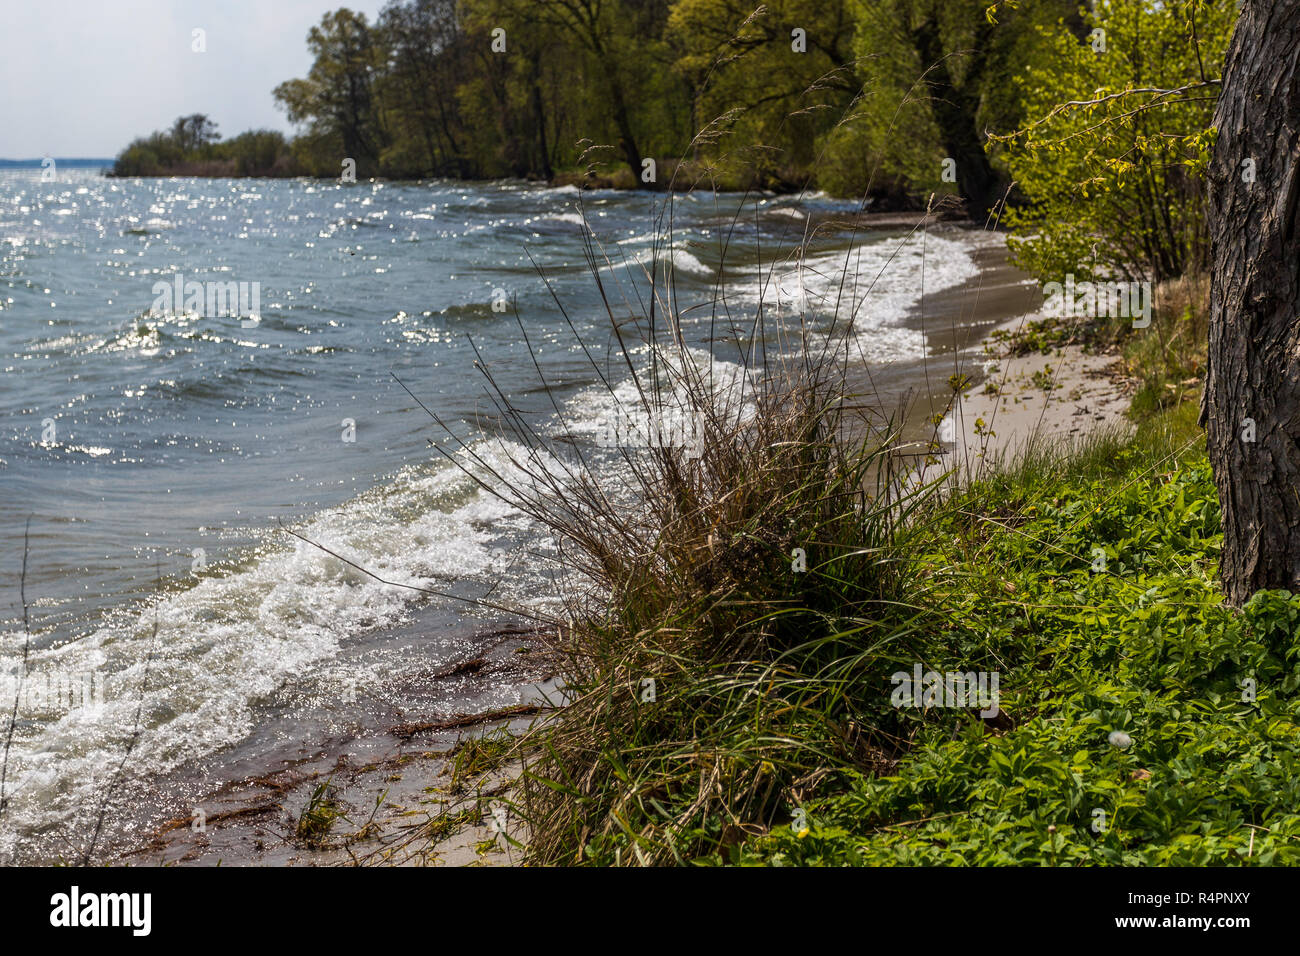 lake müritz - Stock Image